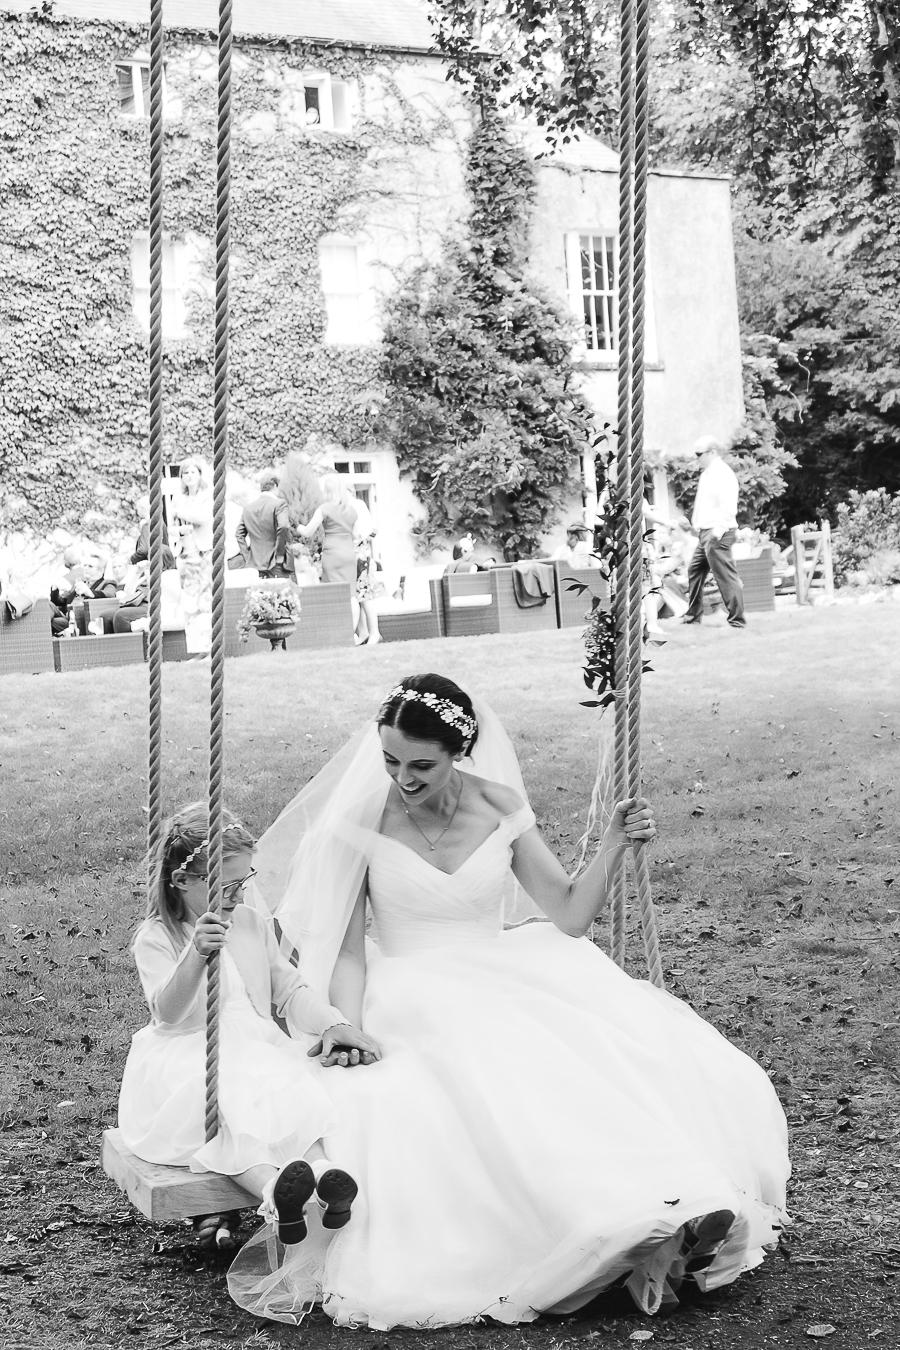 OurBeautifulAdventure-FairyhillWedding-John&Zoe-WeddingBlog-2-2.jpg